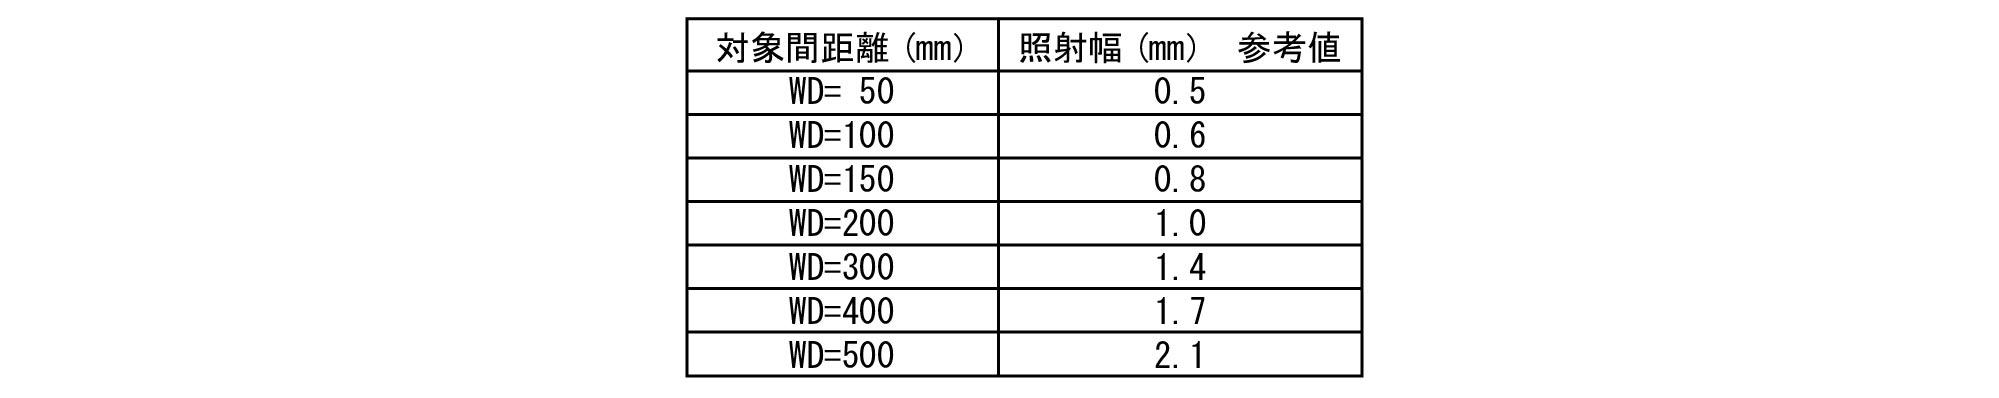 IDBA-SL Product Description 02